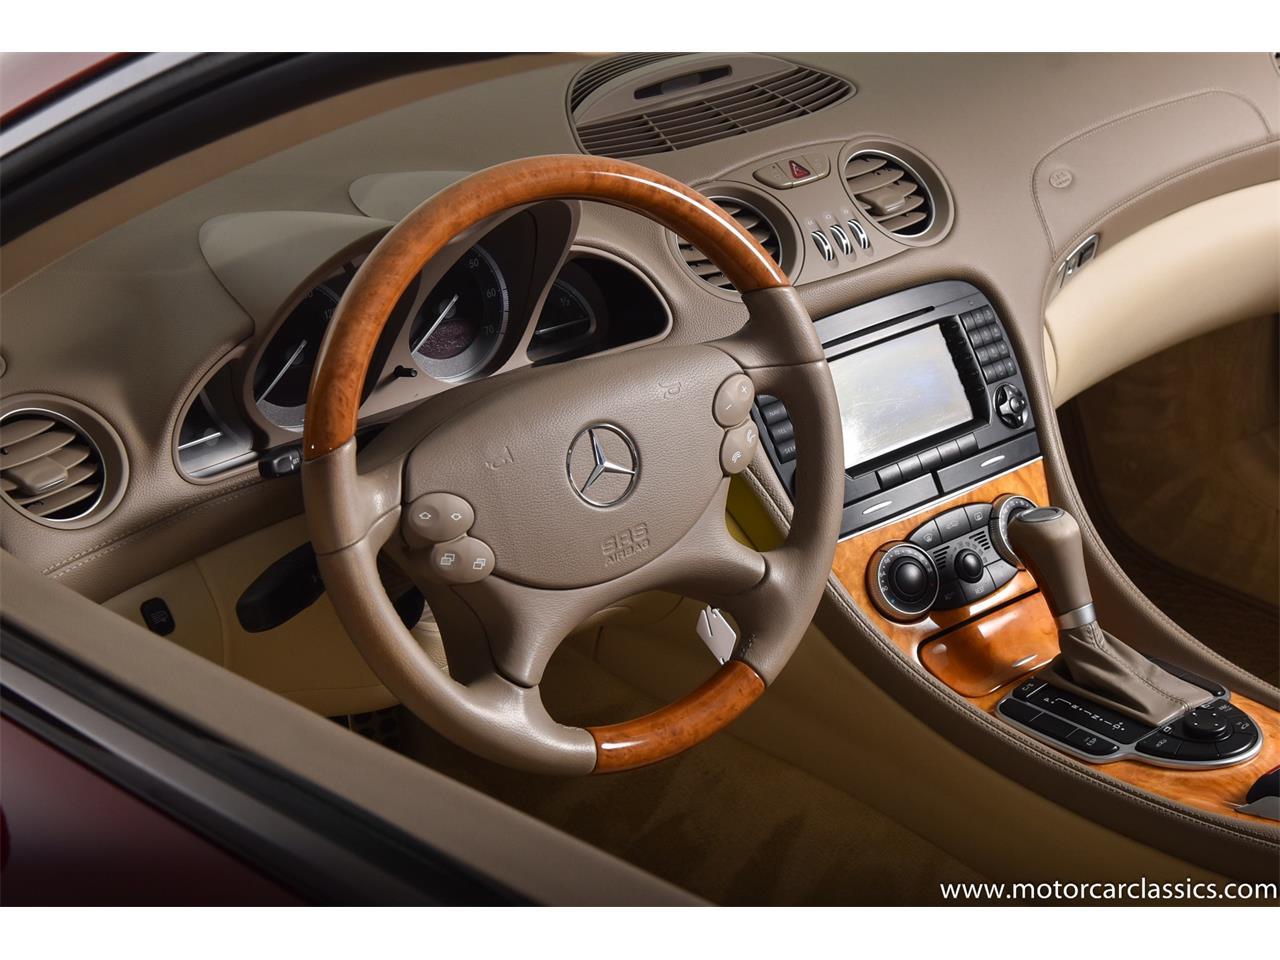 2005 Mercedes-Benz SL-Class (CC-1423441) for sale in Farmingdale, New York